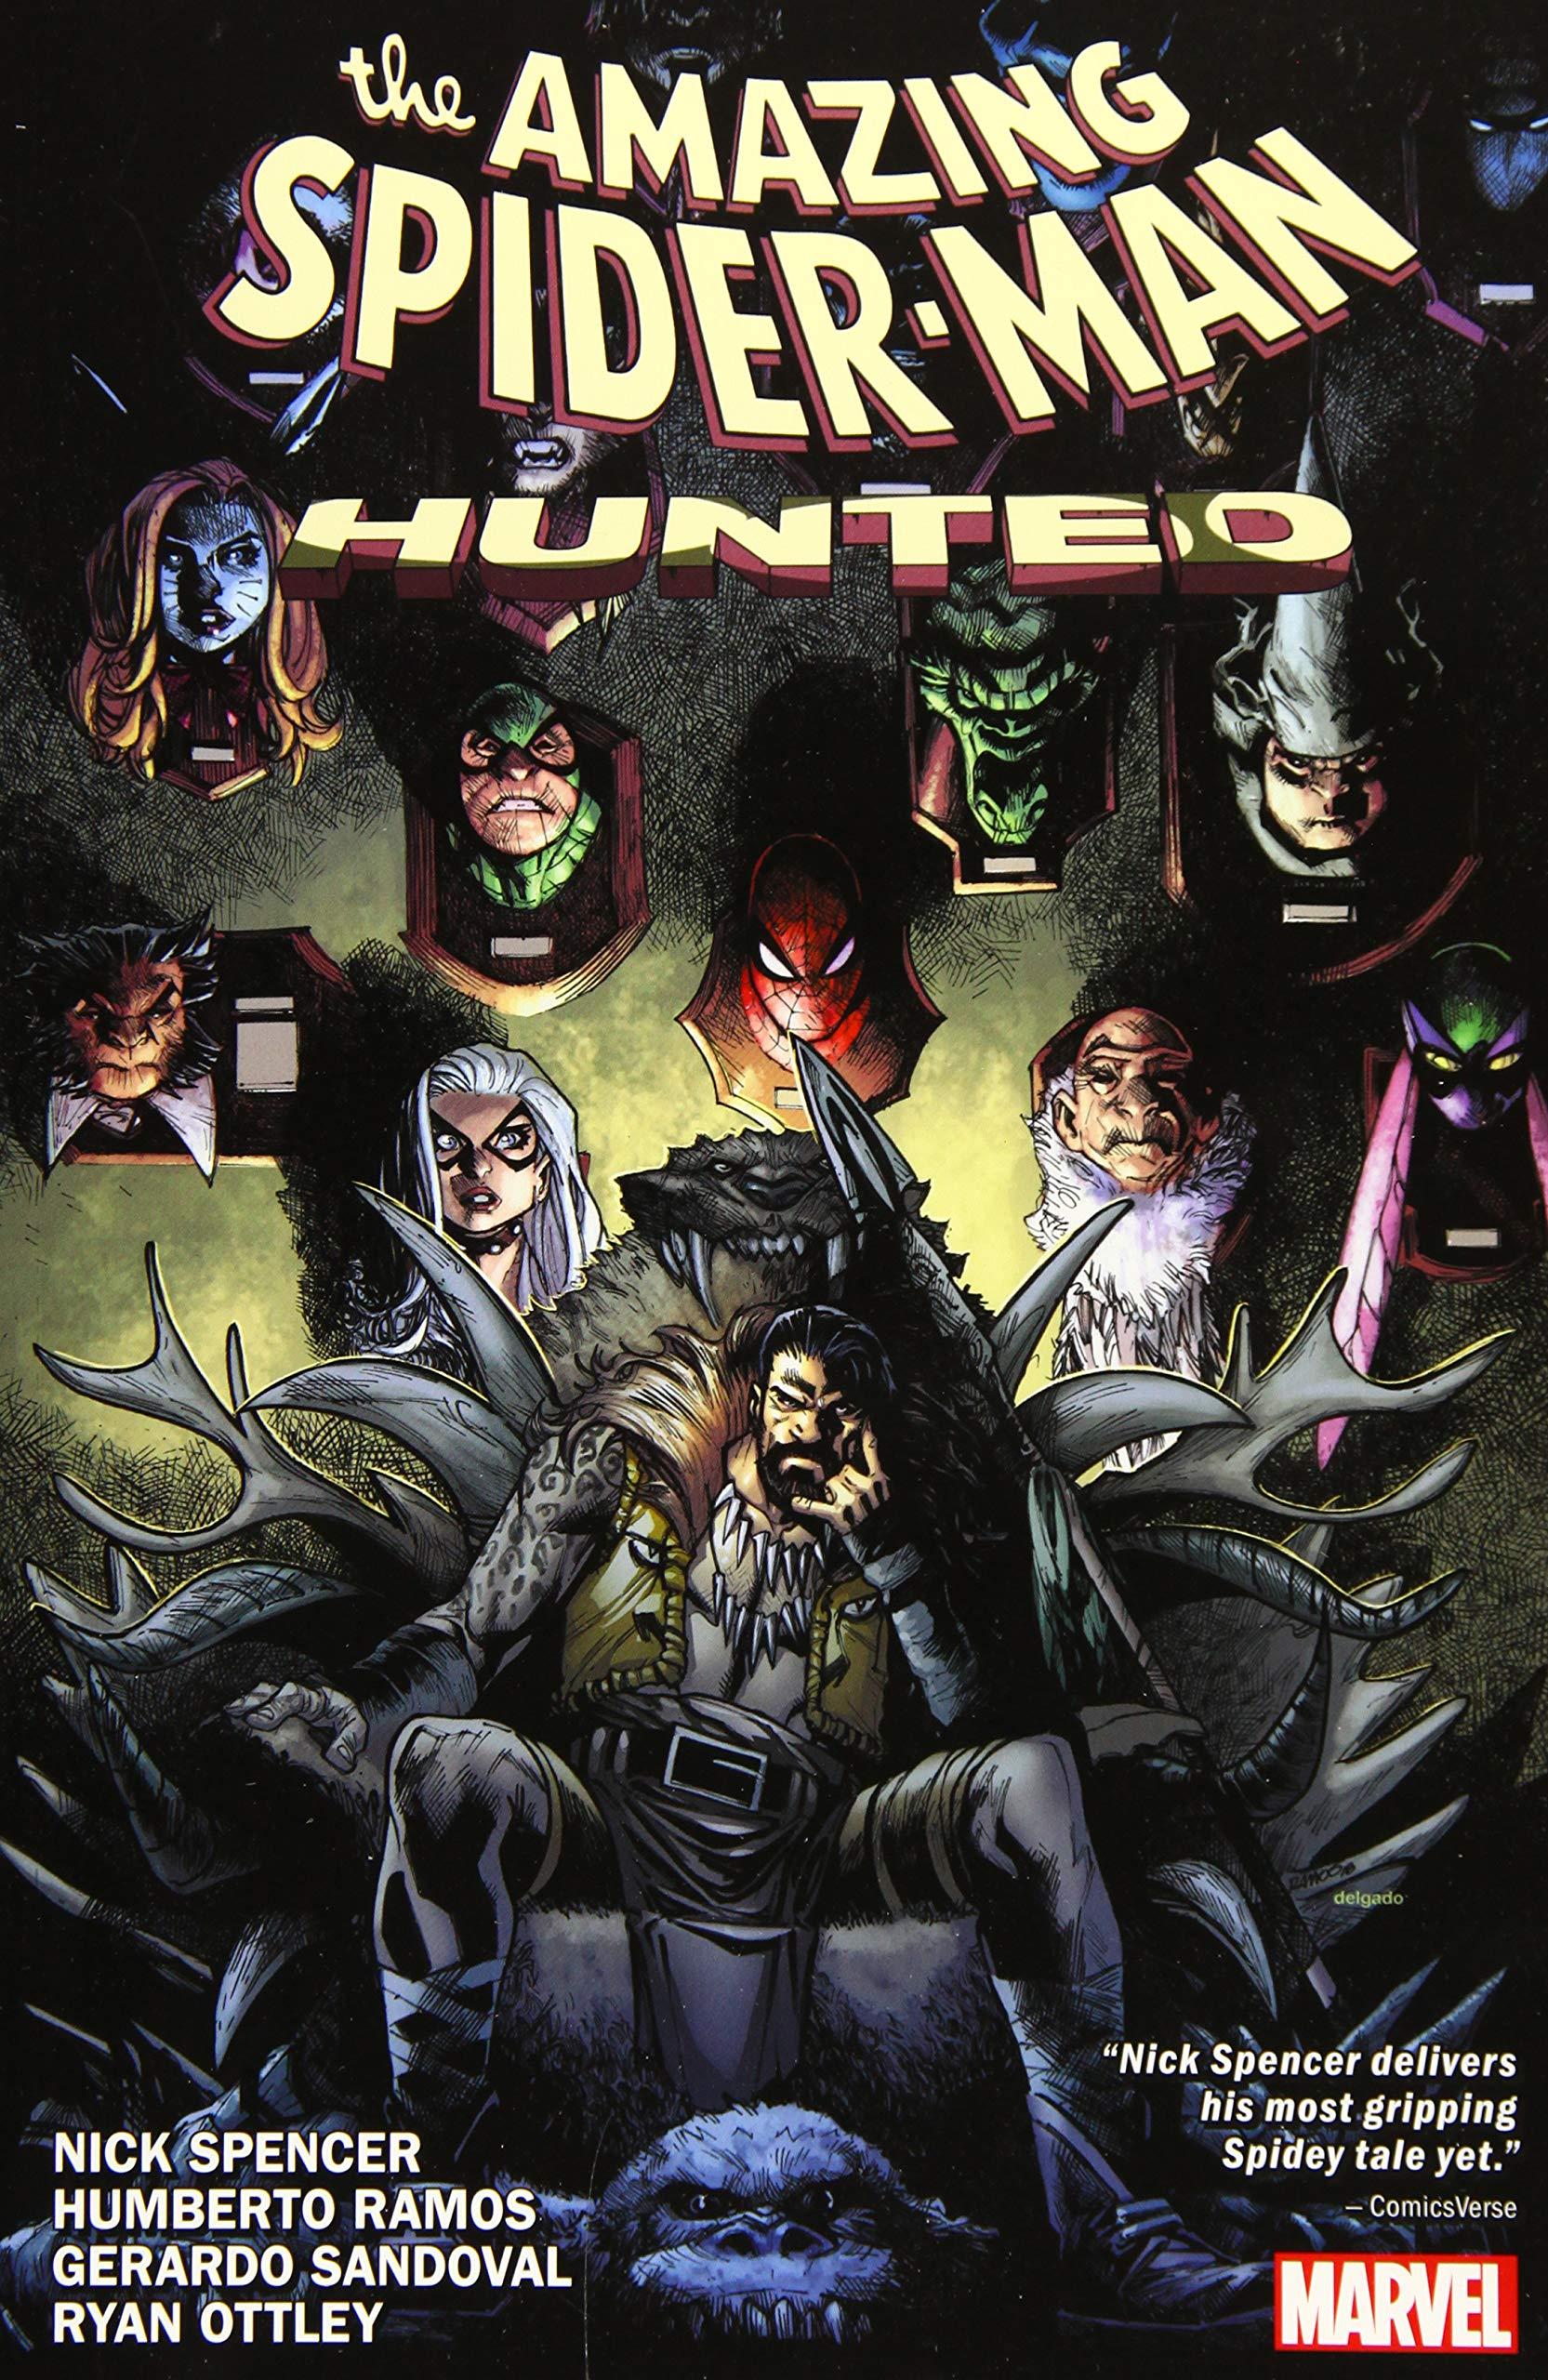 Amazon.com: Amazing Spider-Man: Hunted (Vol. 4) TPB (9781302914349):  Spencer, Nick, Ottley, Ryan: Books